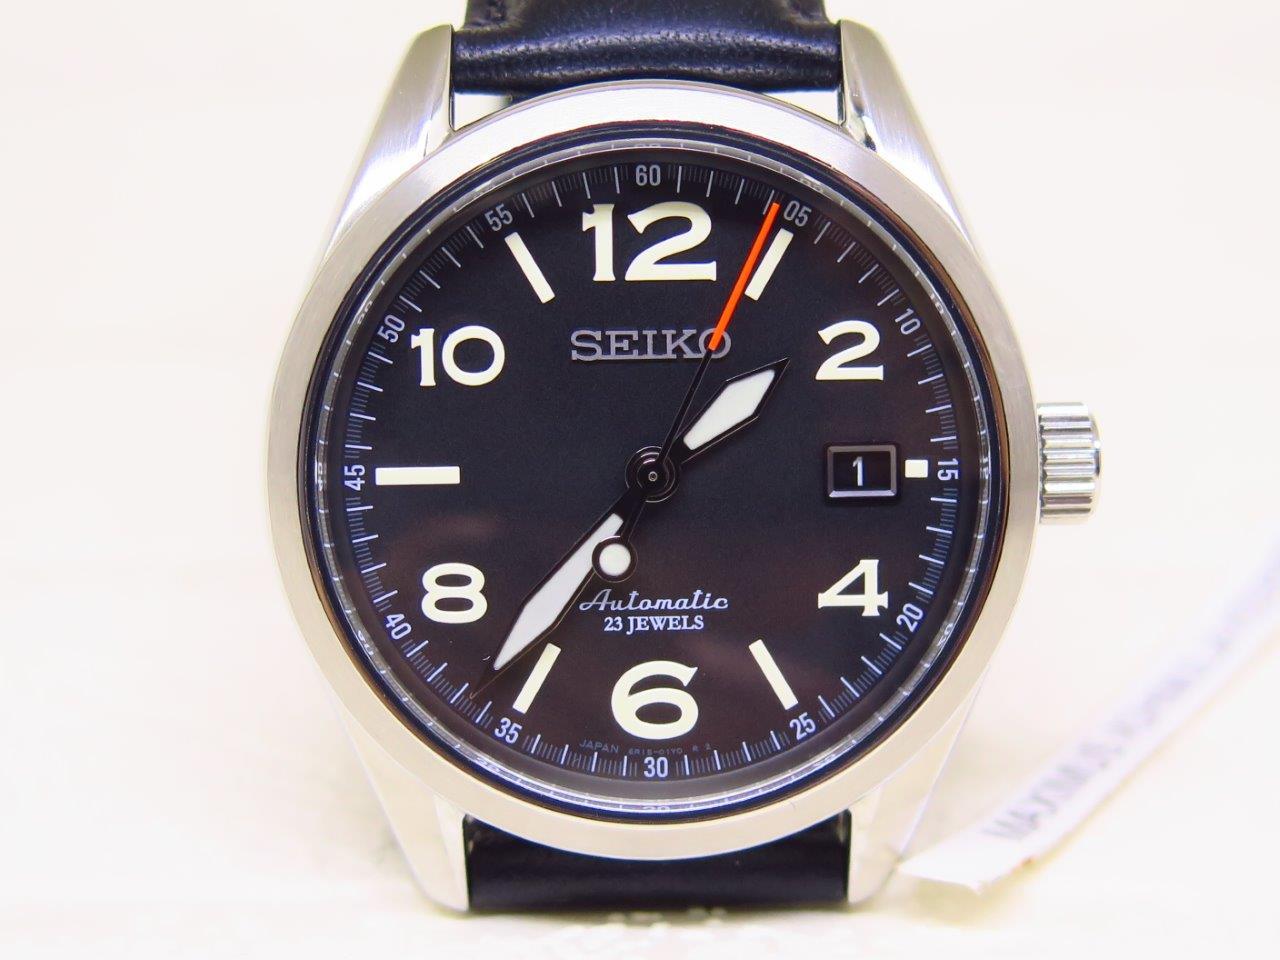 SEIKO SARG011 - AUTOMATIC 6R15C